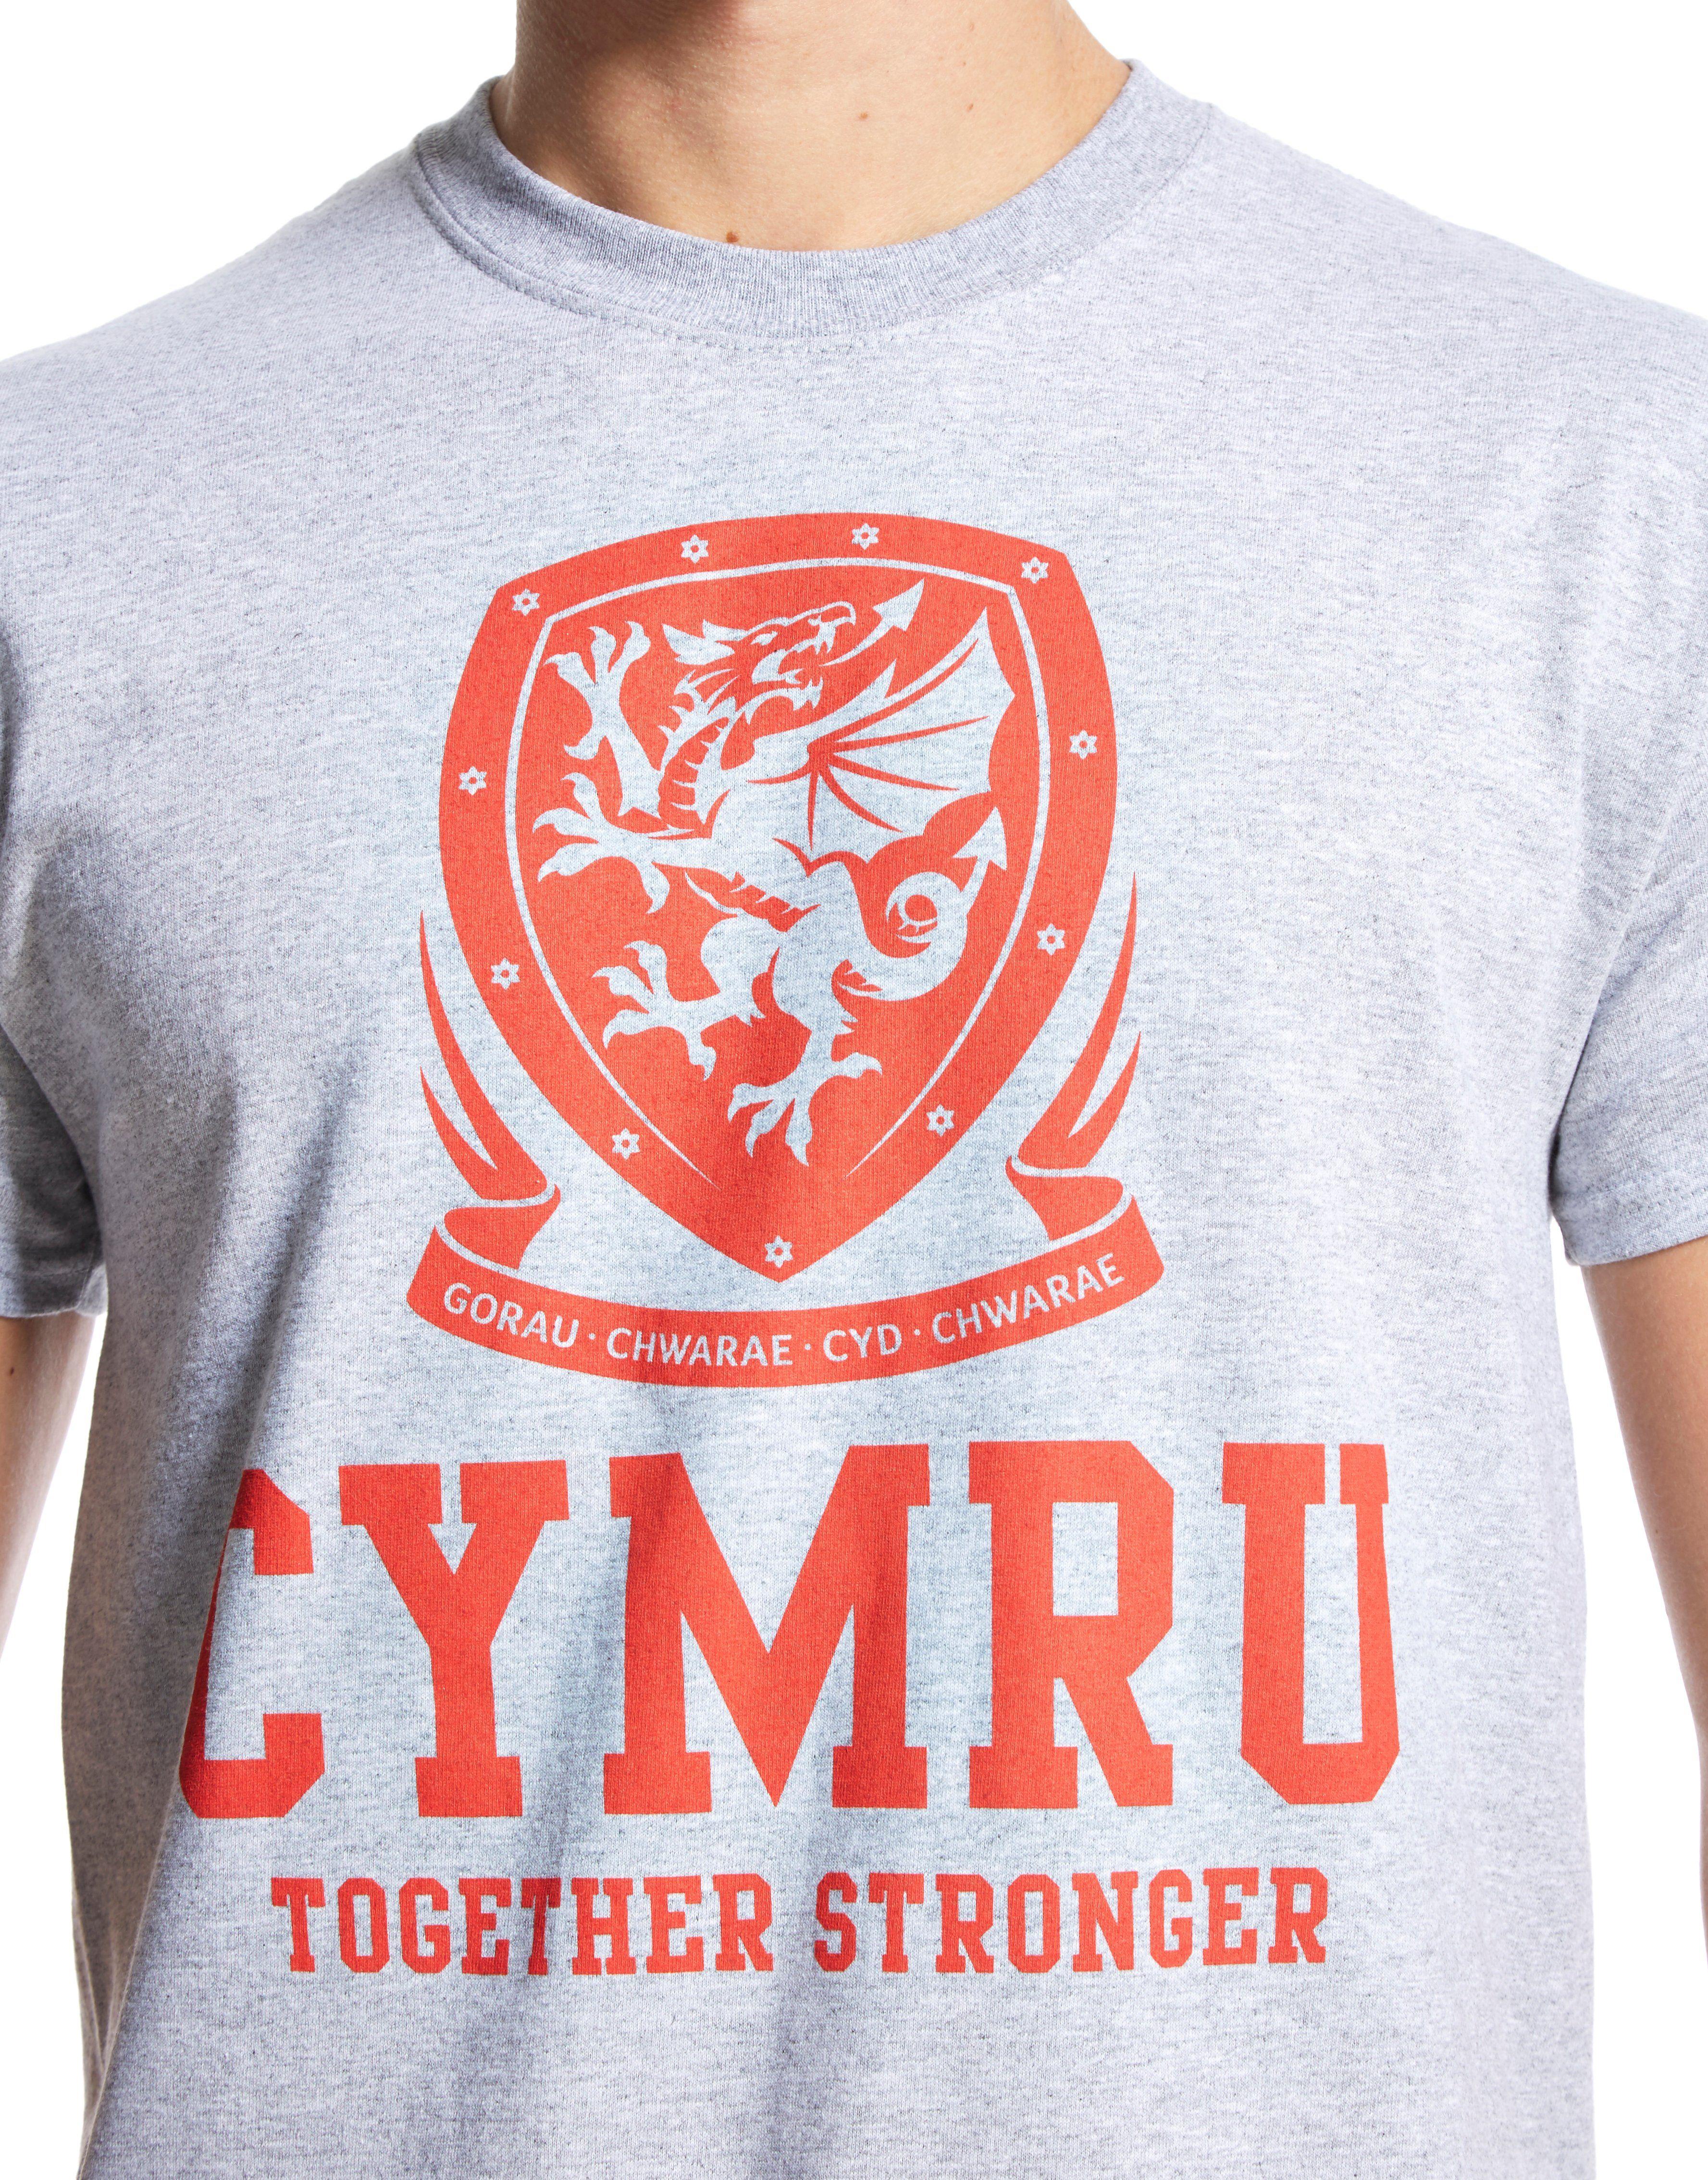 Official Team Wales Cymru T-Shirt